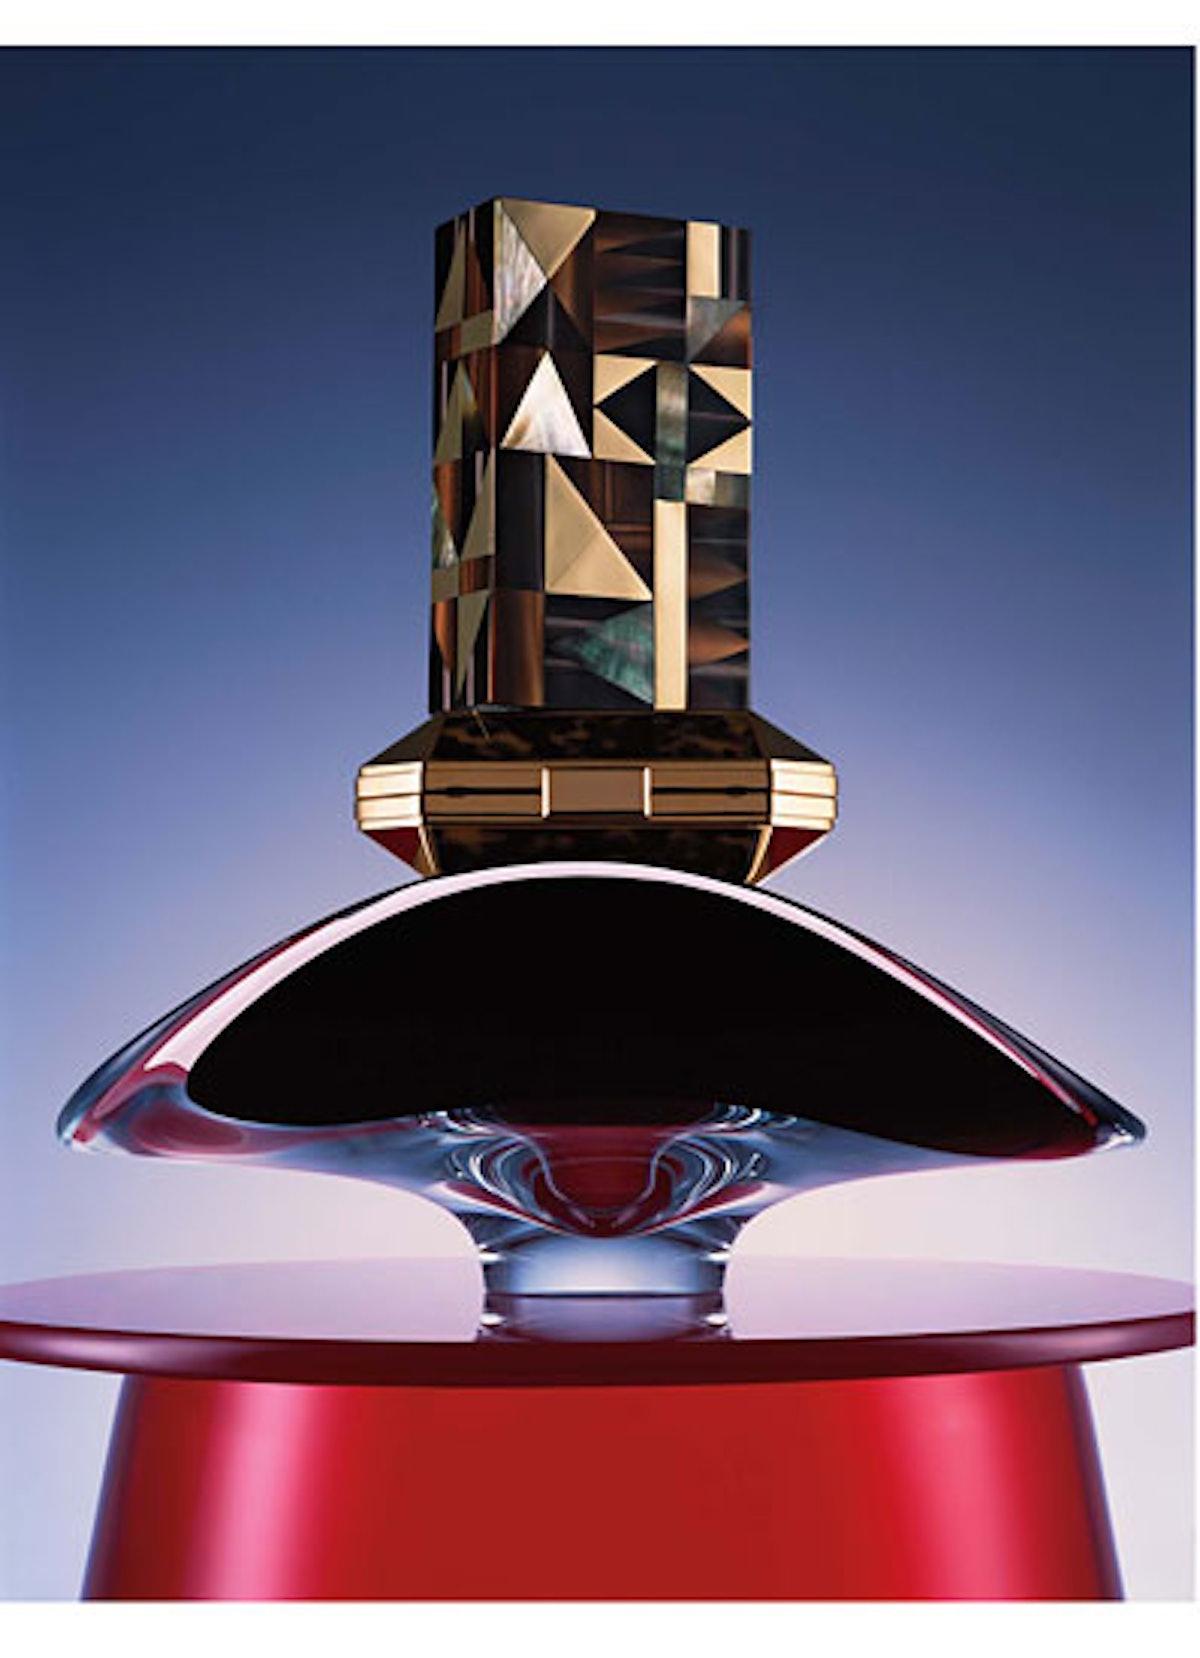 acss-sculptural-jewels-03-v.jpg